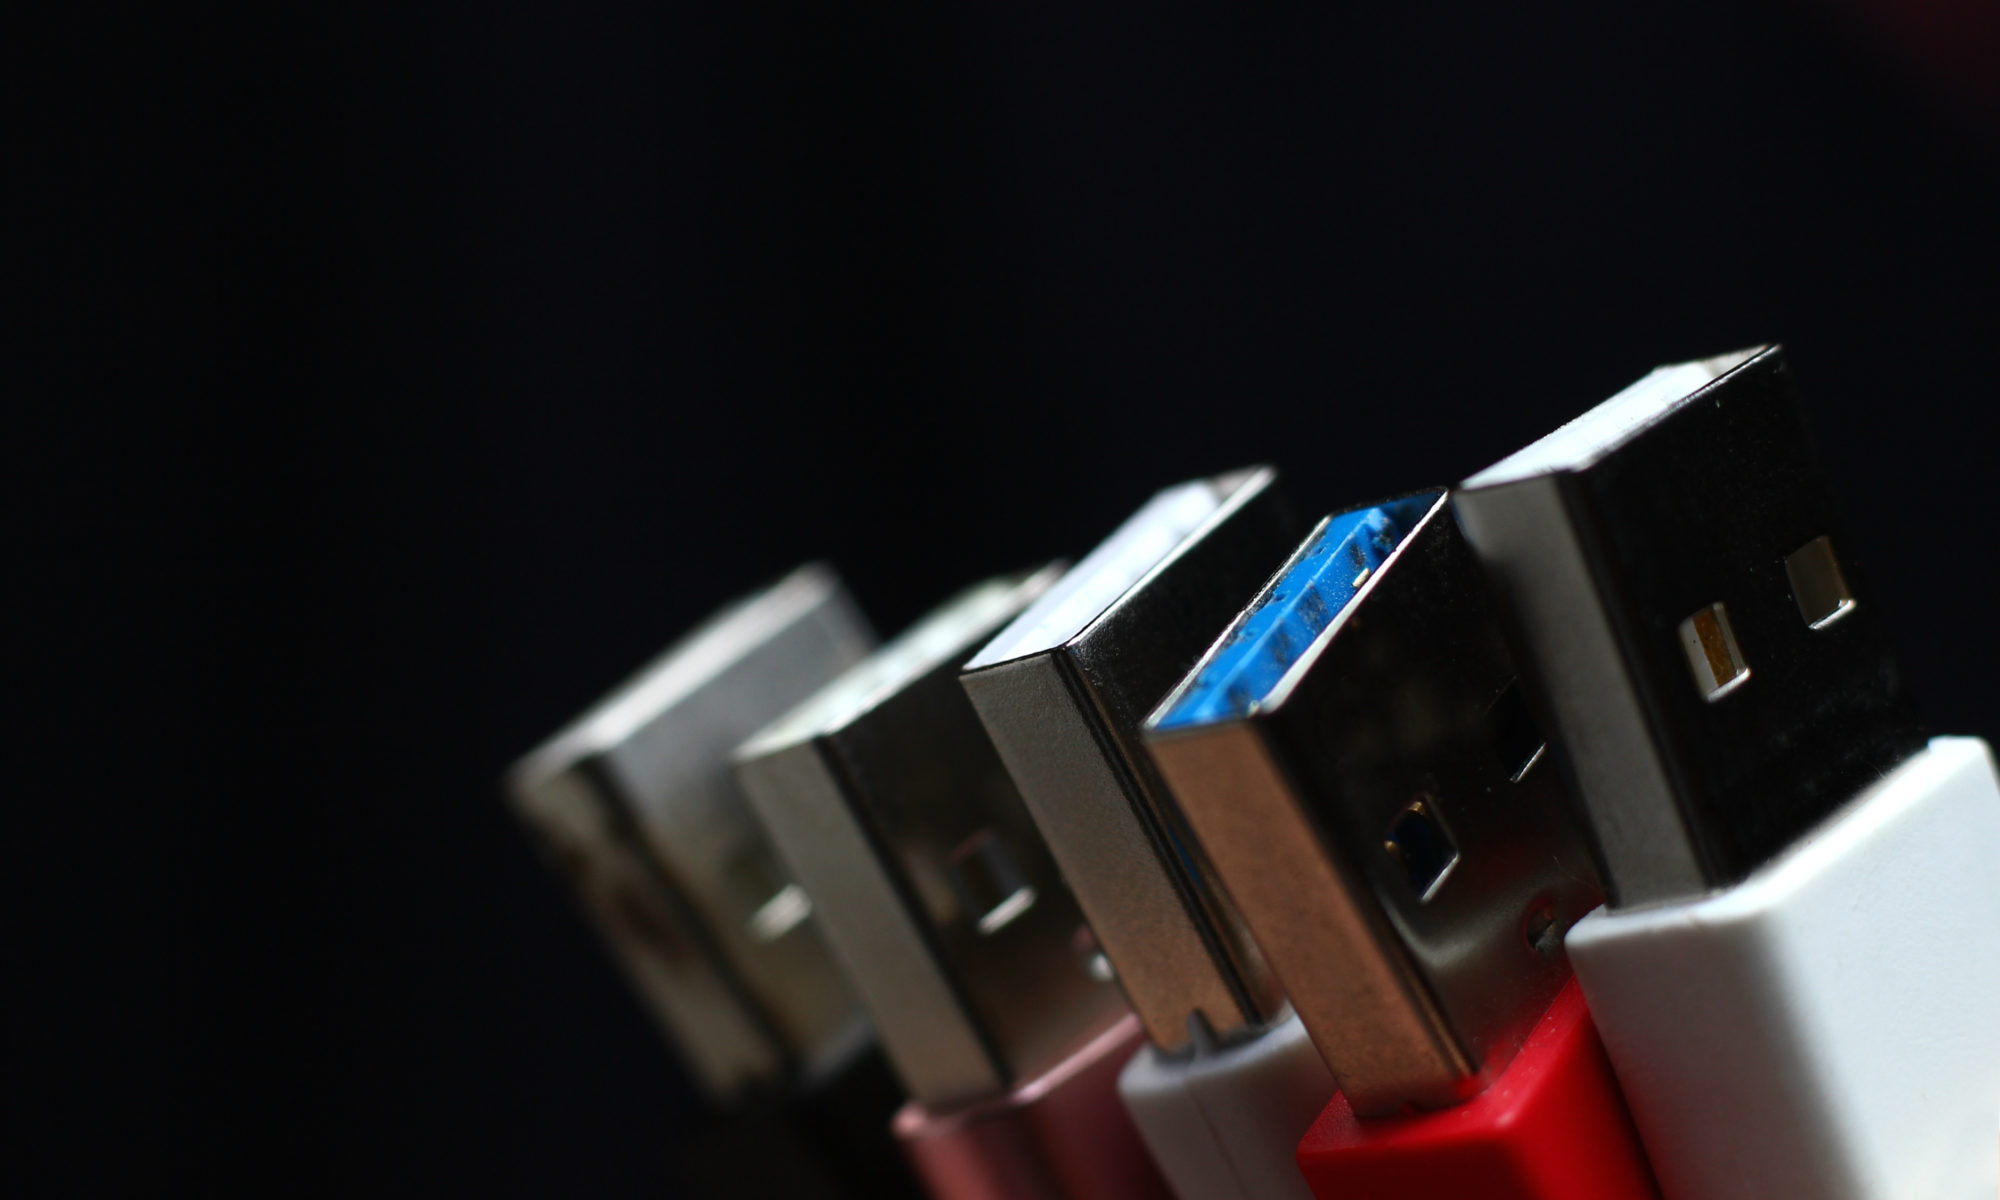 kolorowe kable USB na czarnym tle